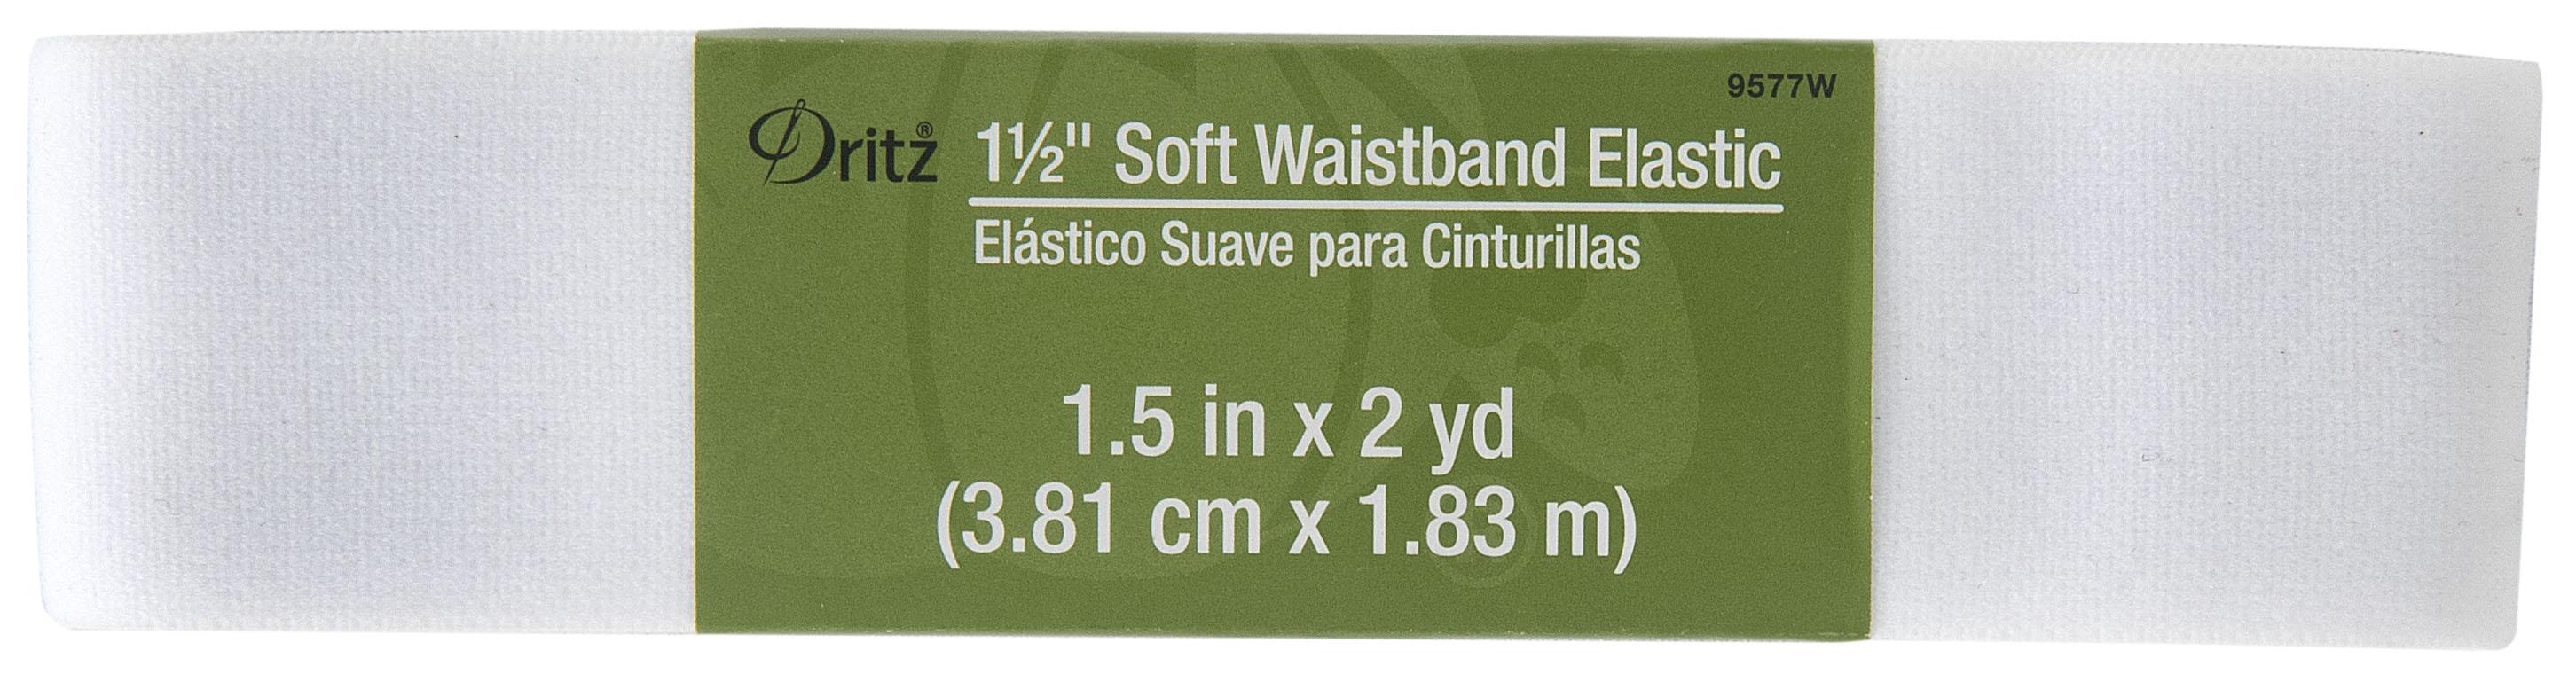 Dritz - 1 1/2in x 2yds Inch Soft Waistband Elastic White